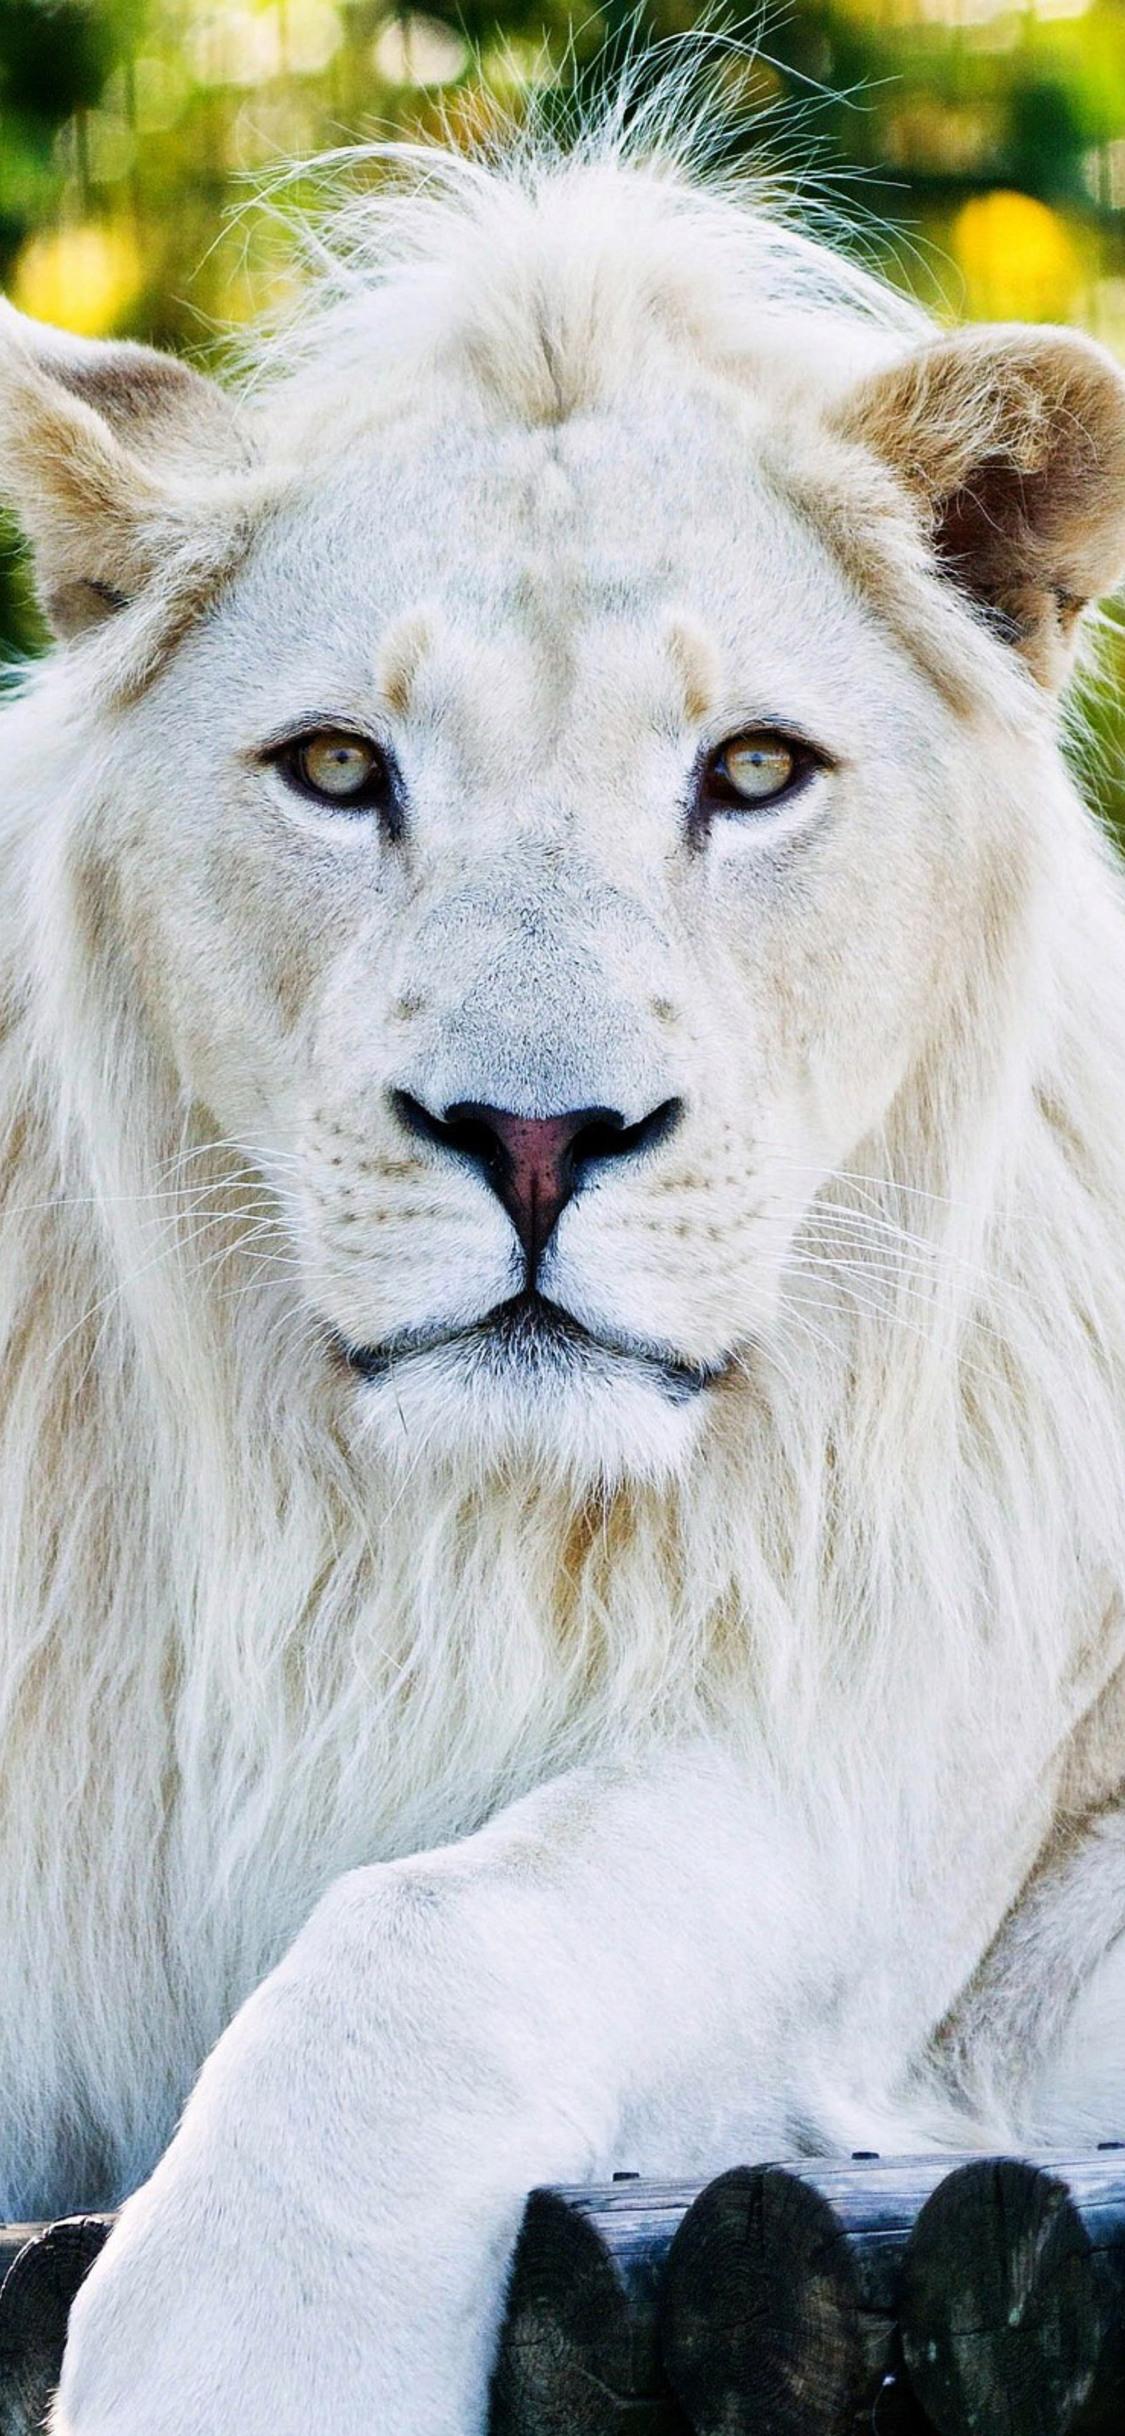 1125x2436 White Lion Iphone Xs Iphone 10 Iphone X Hd 4k